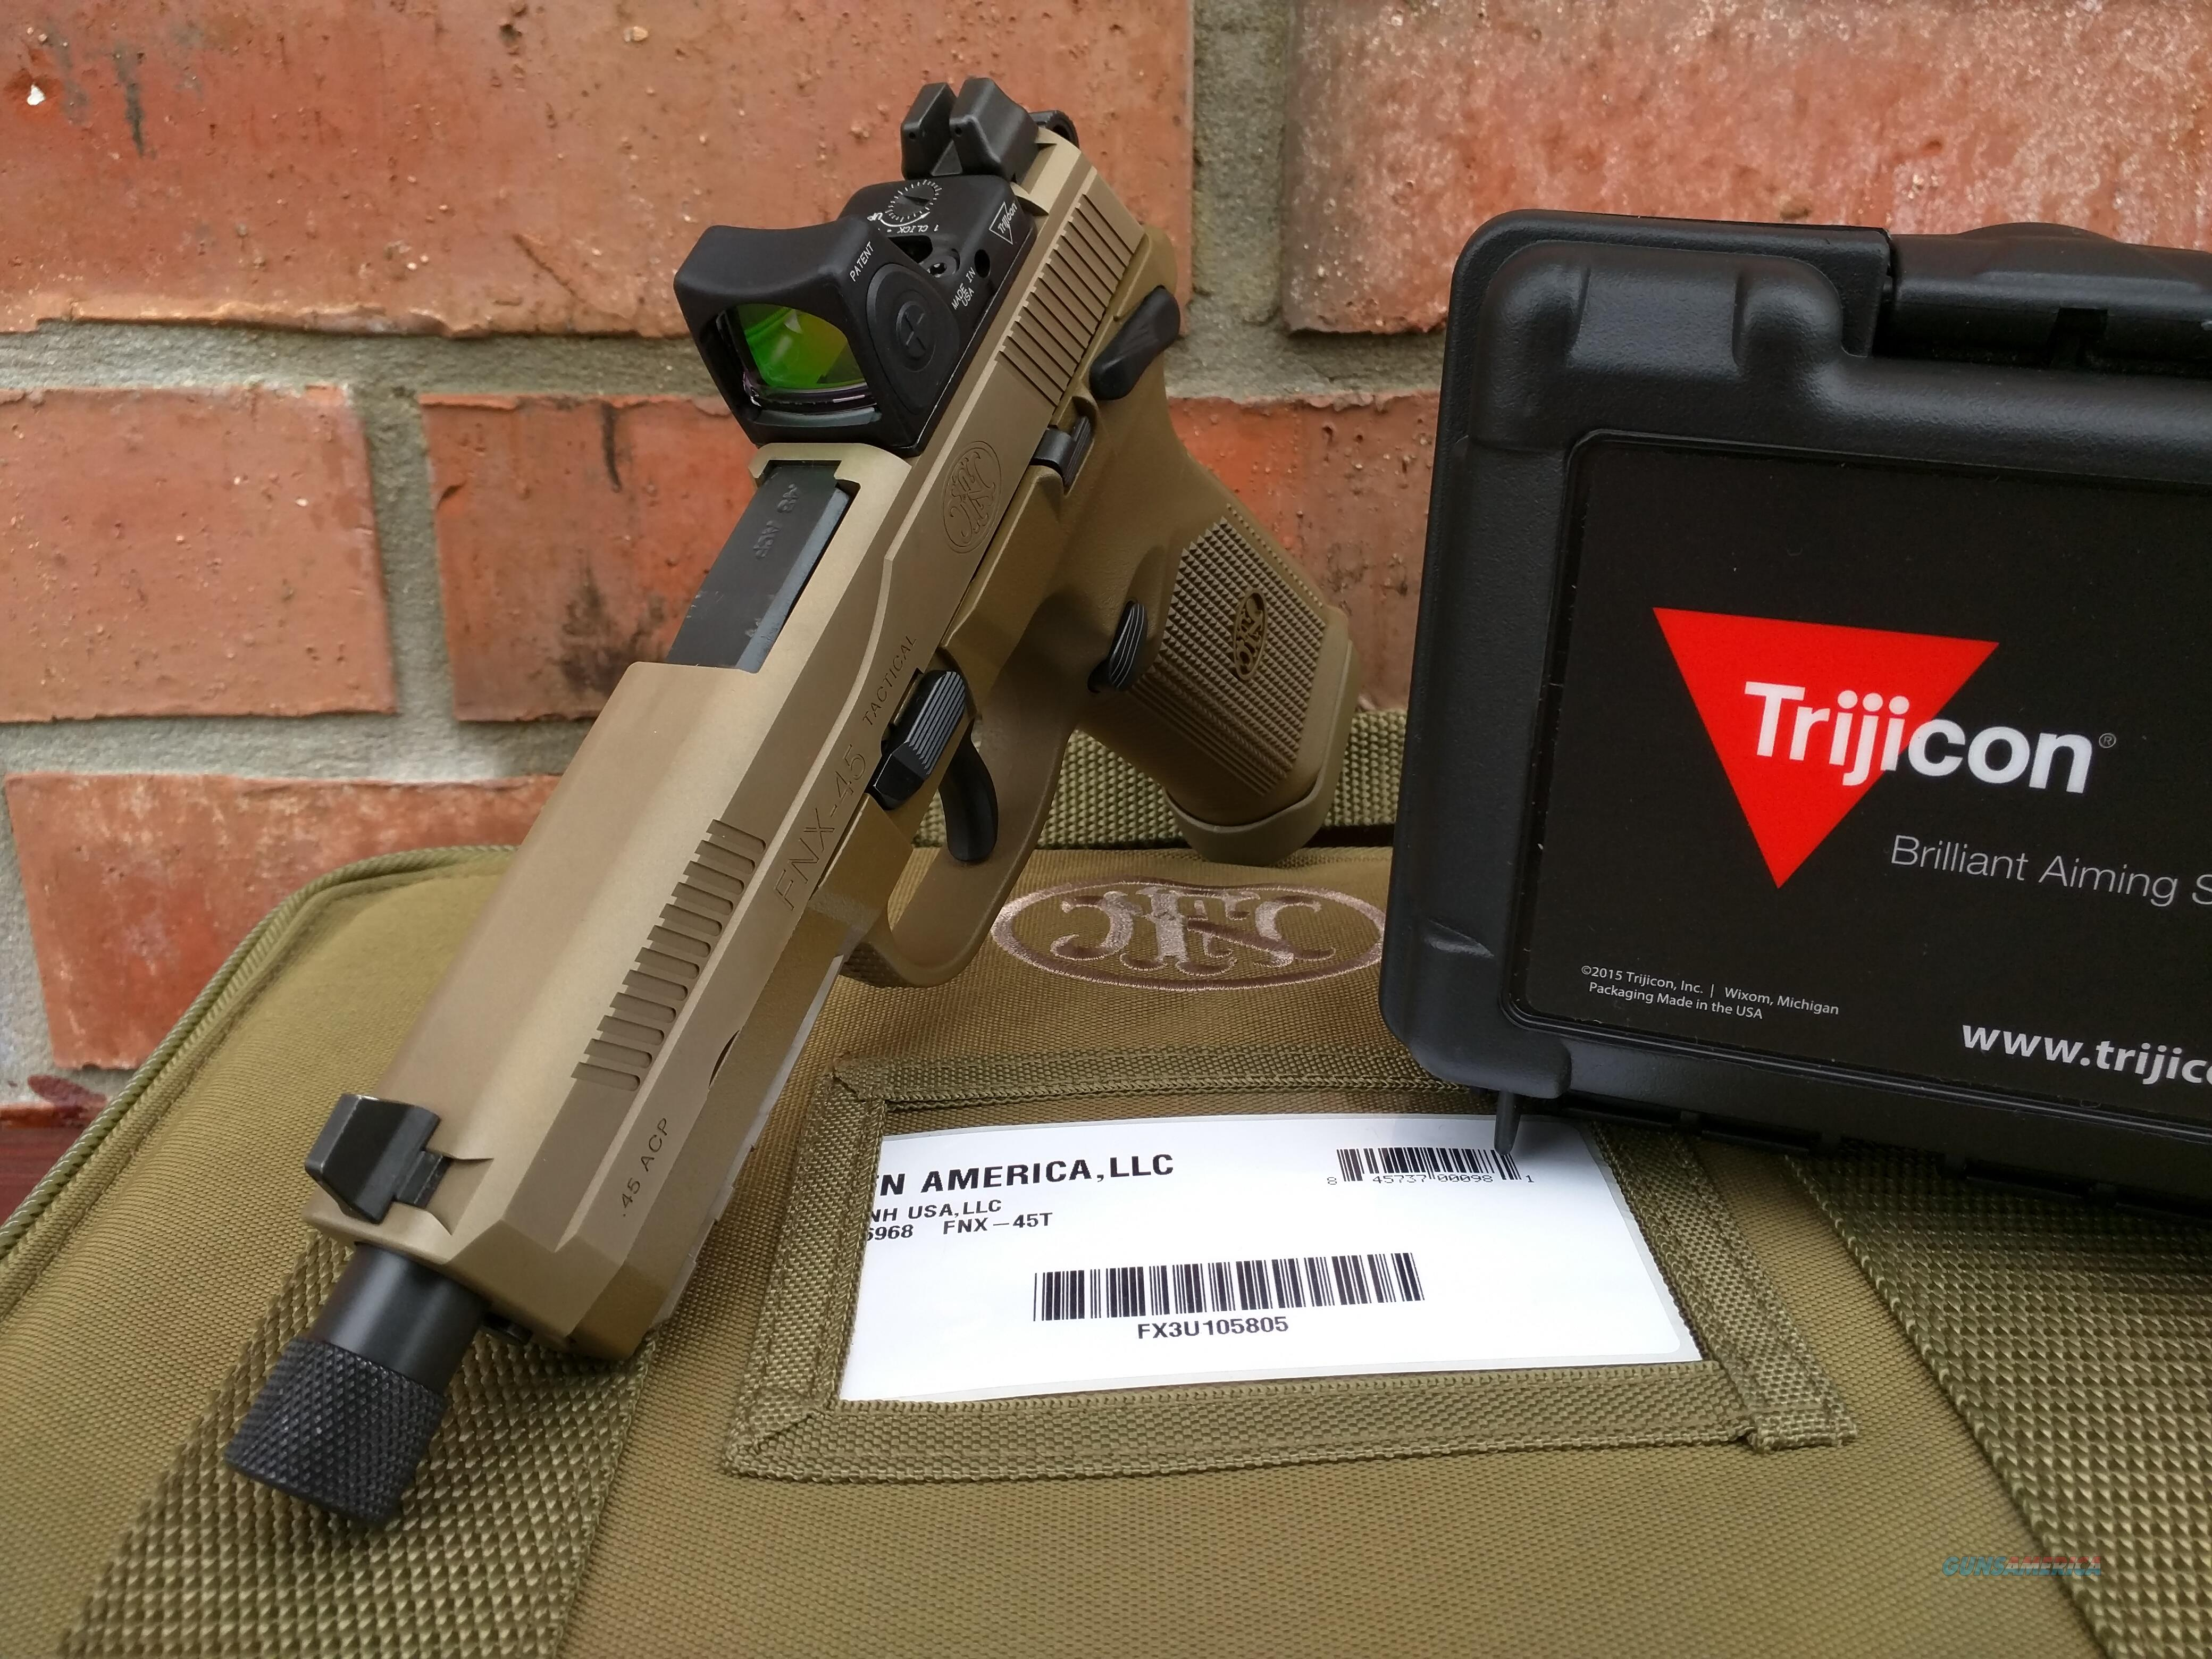 FN FNH FNX-45T ACP FDE, Trijicon RMR type 2 Adj LED 3.25 MOA Red dot,(3) 15 round mags, Threaded barrel, SA/DA, Suppressor height night sights, manual safety, all NIB, FREE LAYAWAY  Guns > Pistols > FNH - Fabrique Nationale (FN) Pistols > FNX